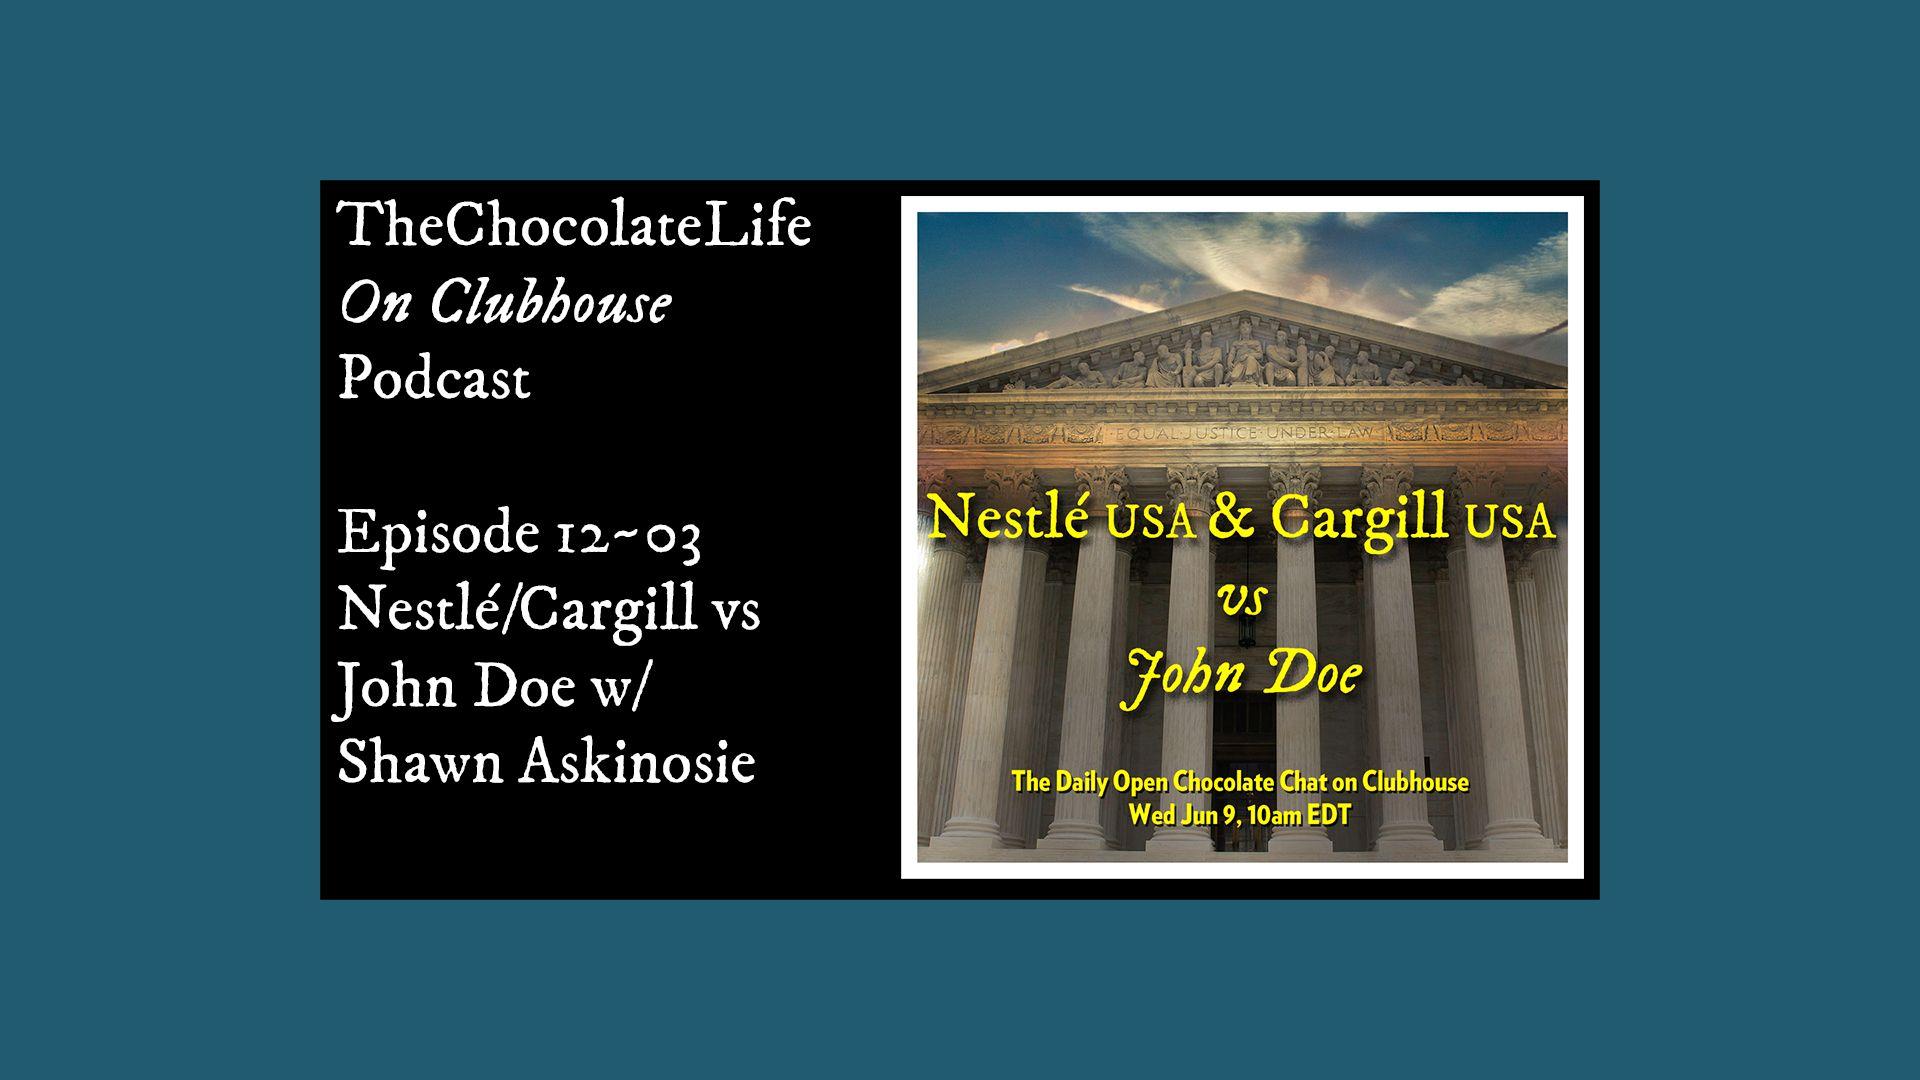 Nestlé & Cargill vs John Doe